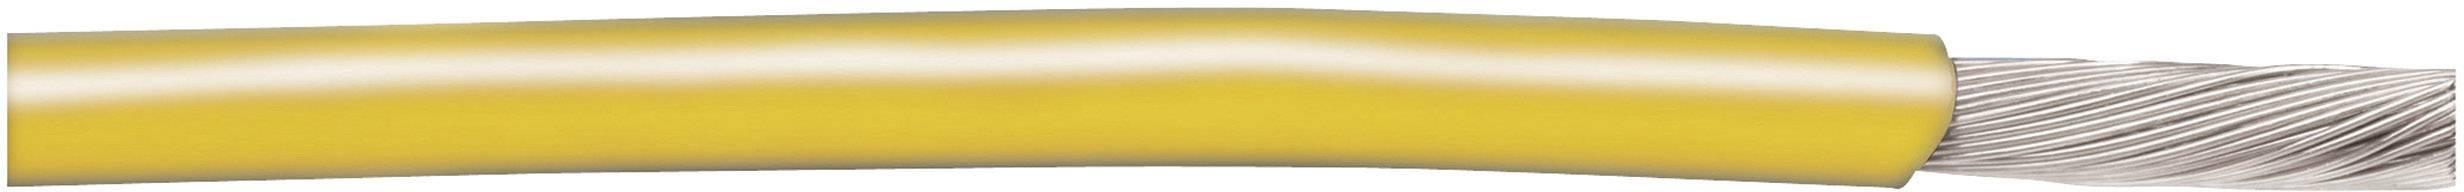 Opletenie / lanko AlphaWire 3077 GY001 1 x 1.31 mm², vonkajší Ø 2.33 mm, metrový tovar